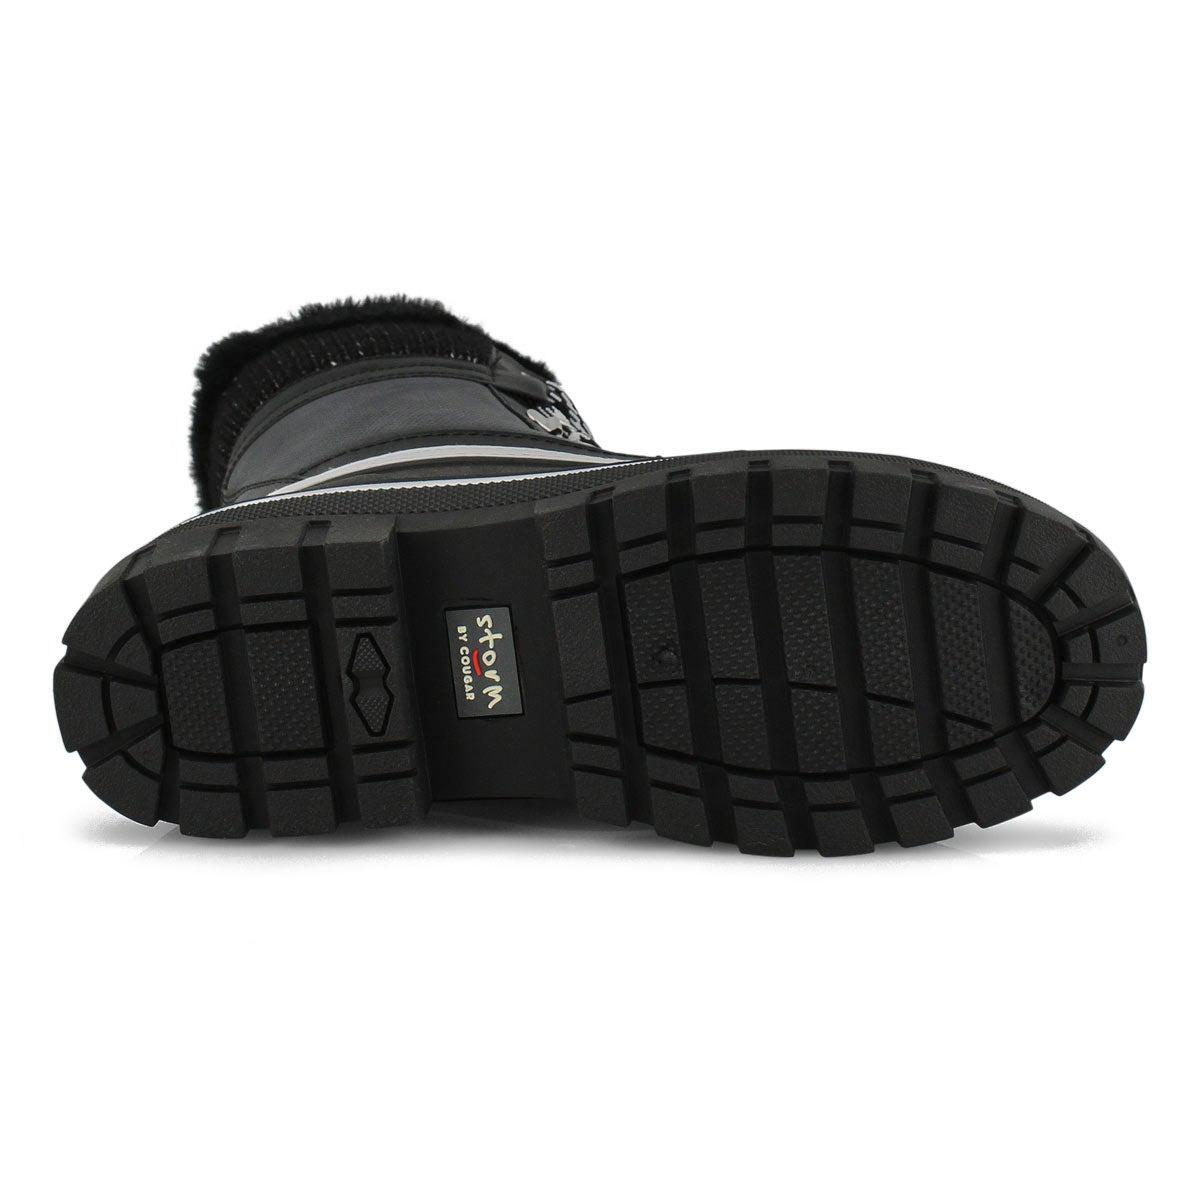 Women's GLEAM black waterproof winter boots